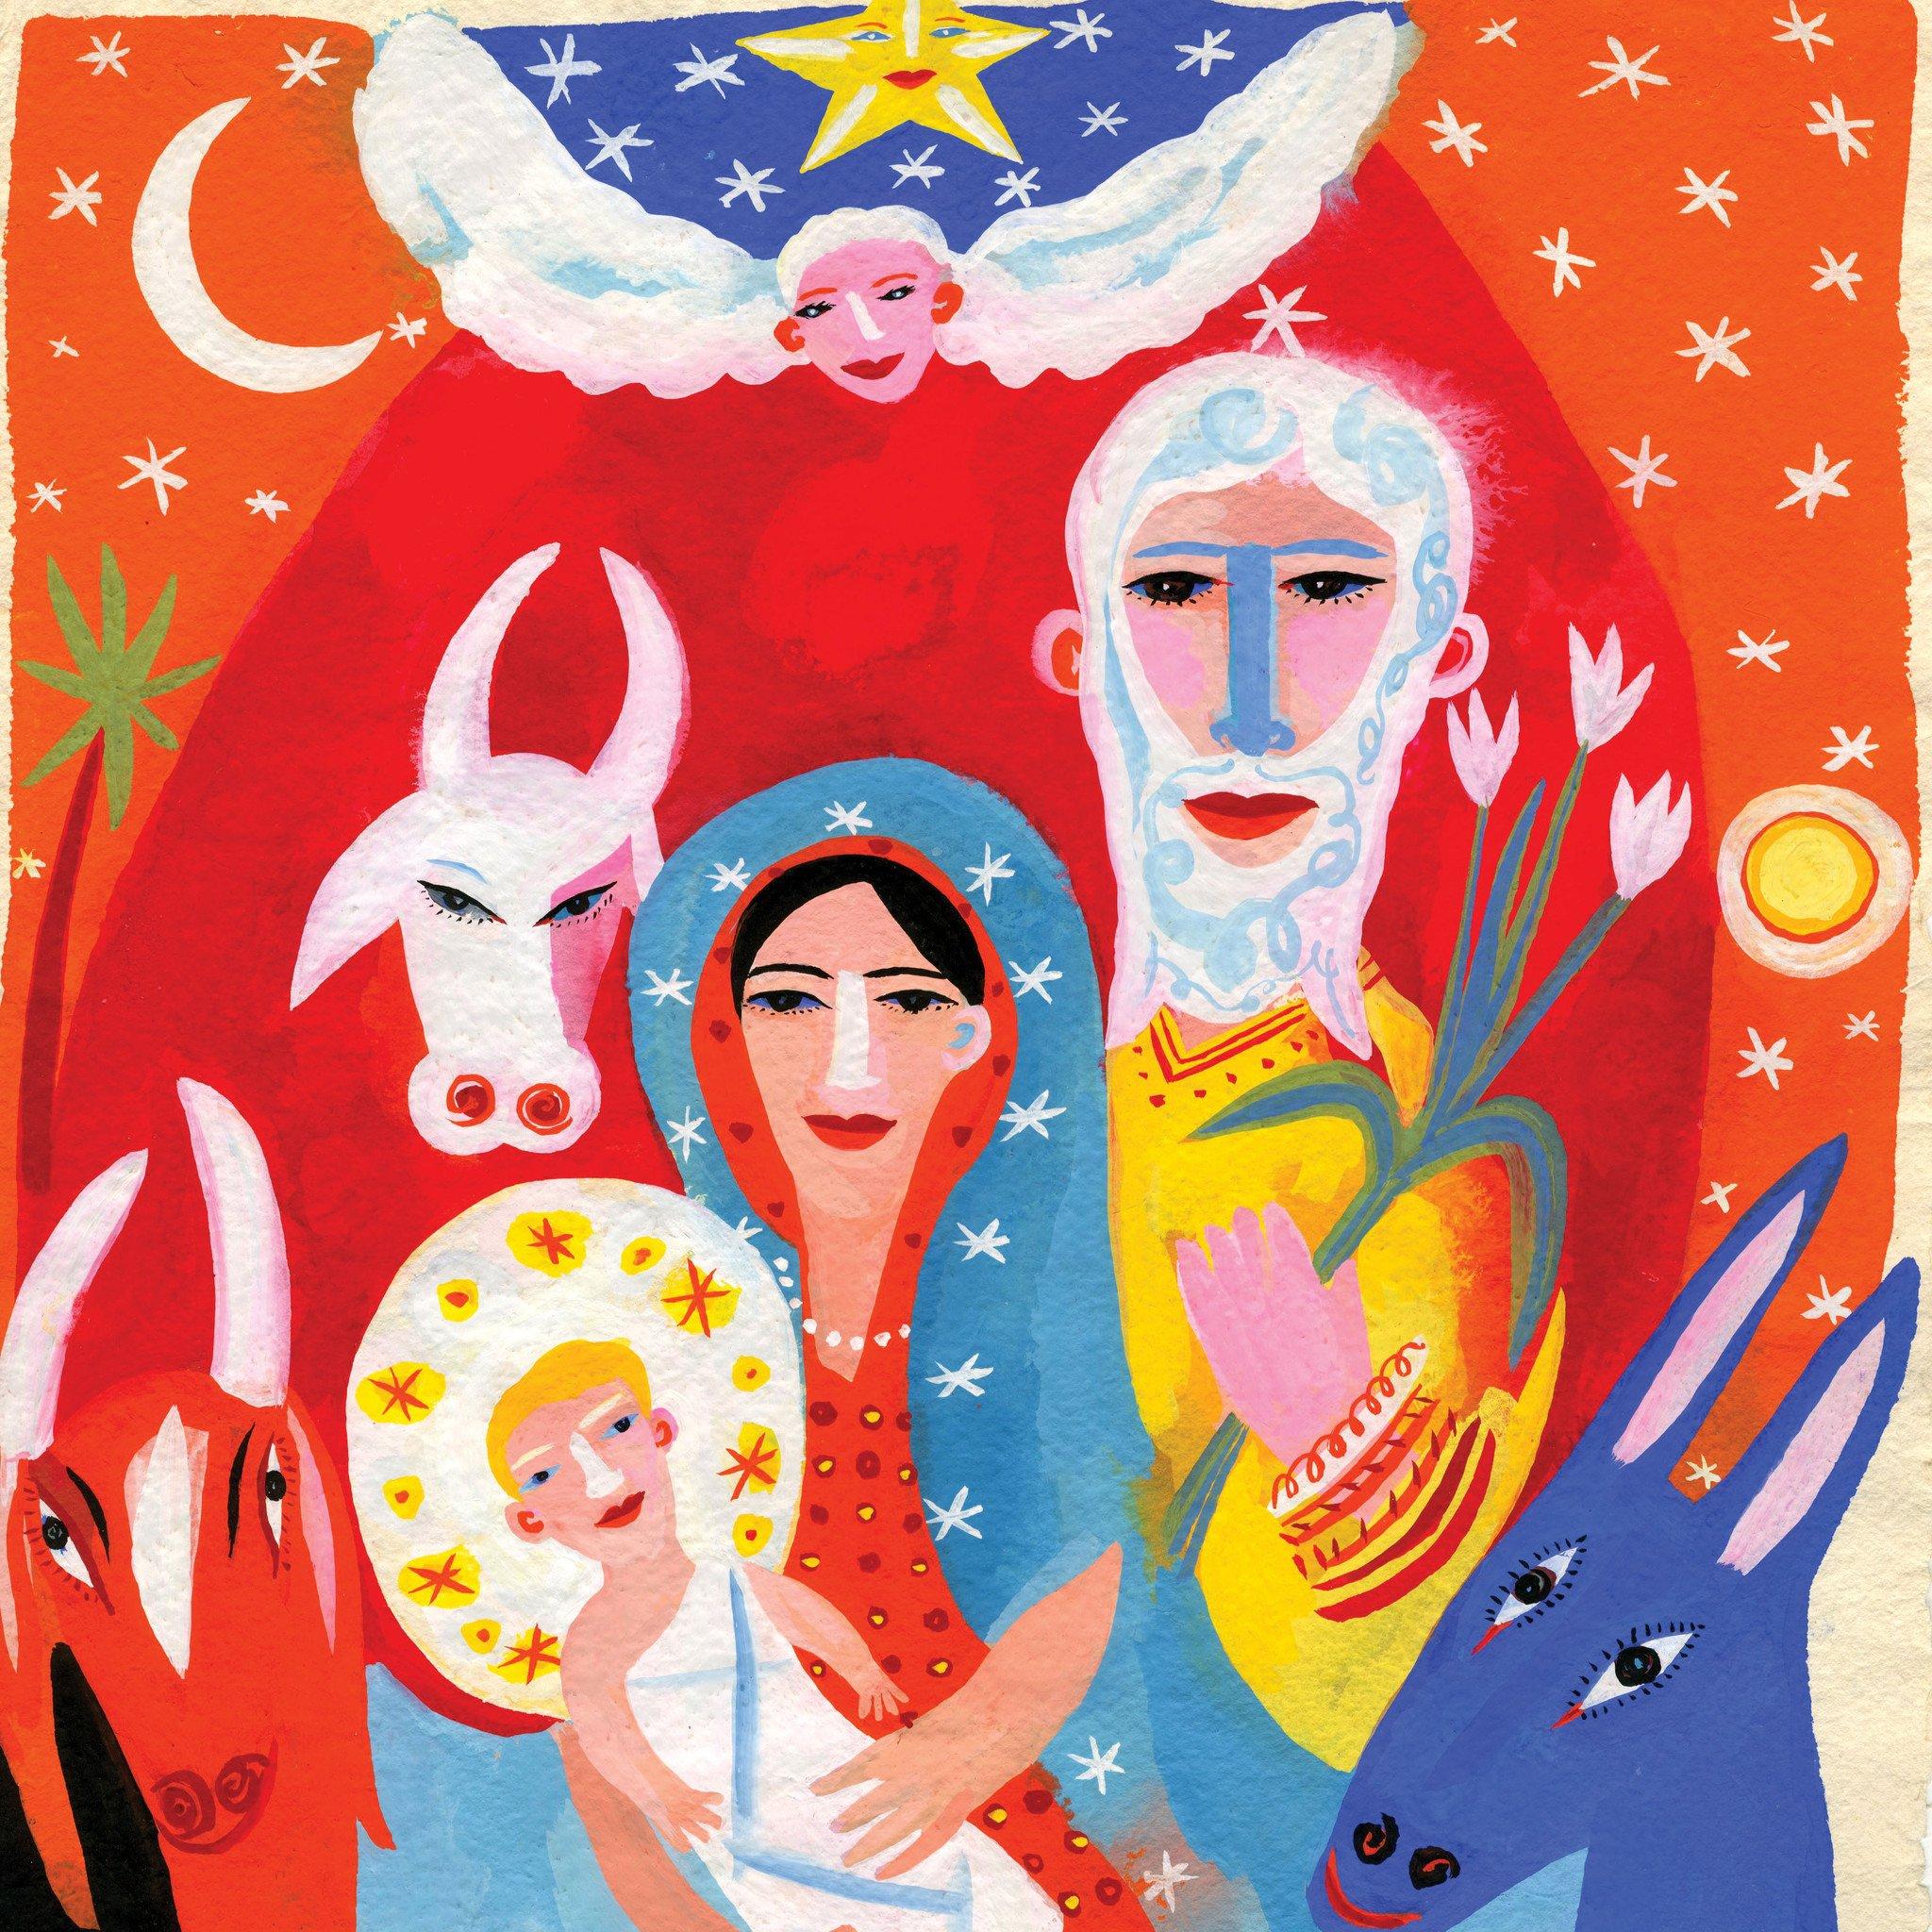 XCC_02_Nativity_Art_by_Christopher_Corr